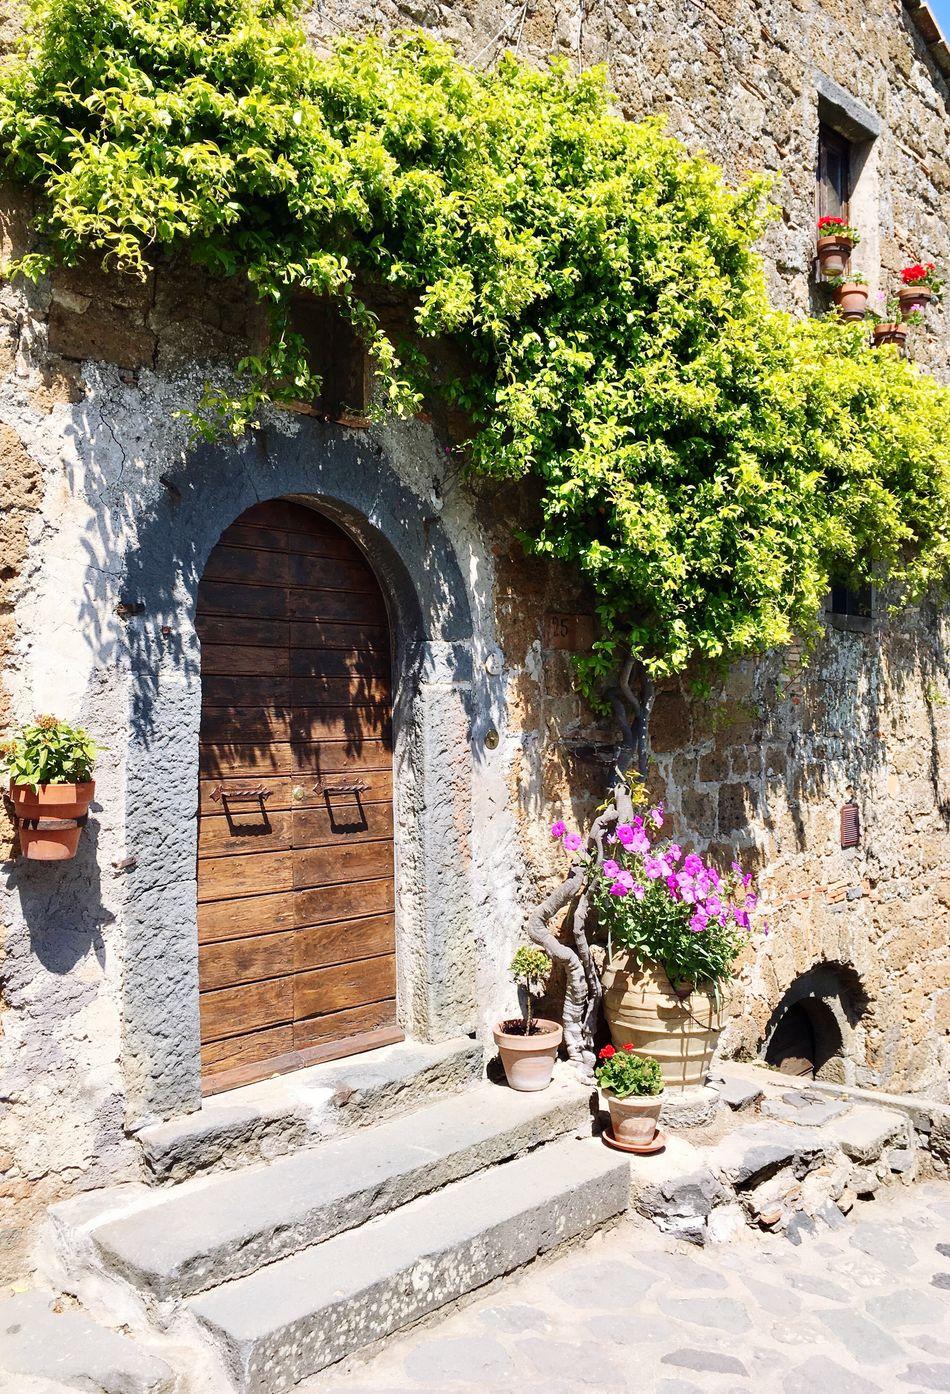 Tuscany Countryside : Civita Di Bagnoregio - Architecture Travel Destinations Door Nature Building Exterior Architecture